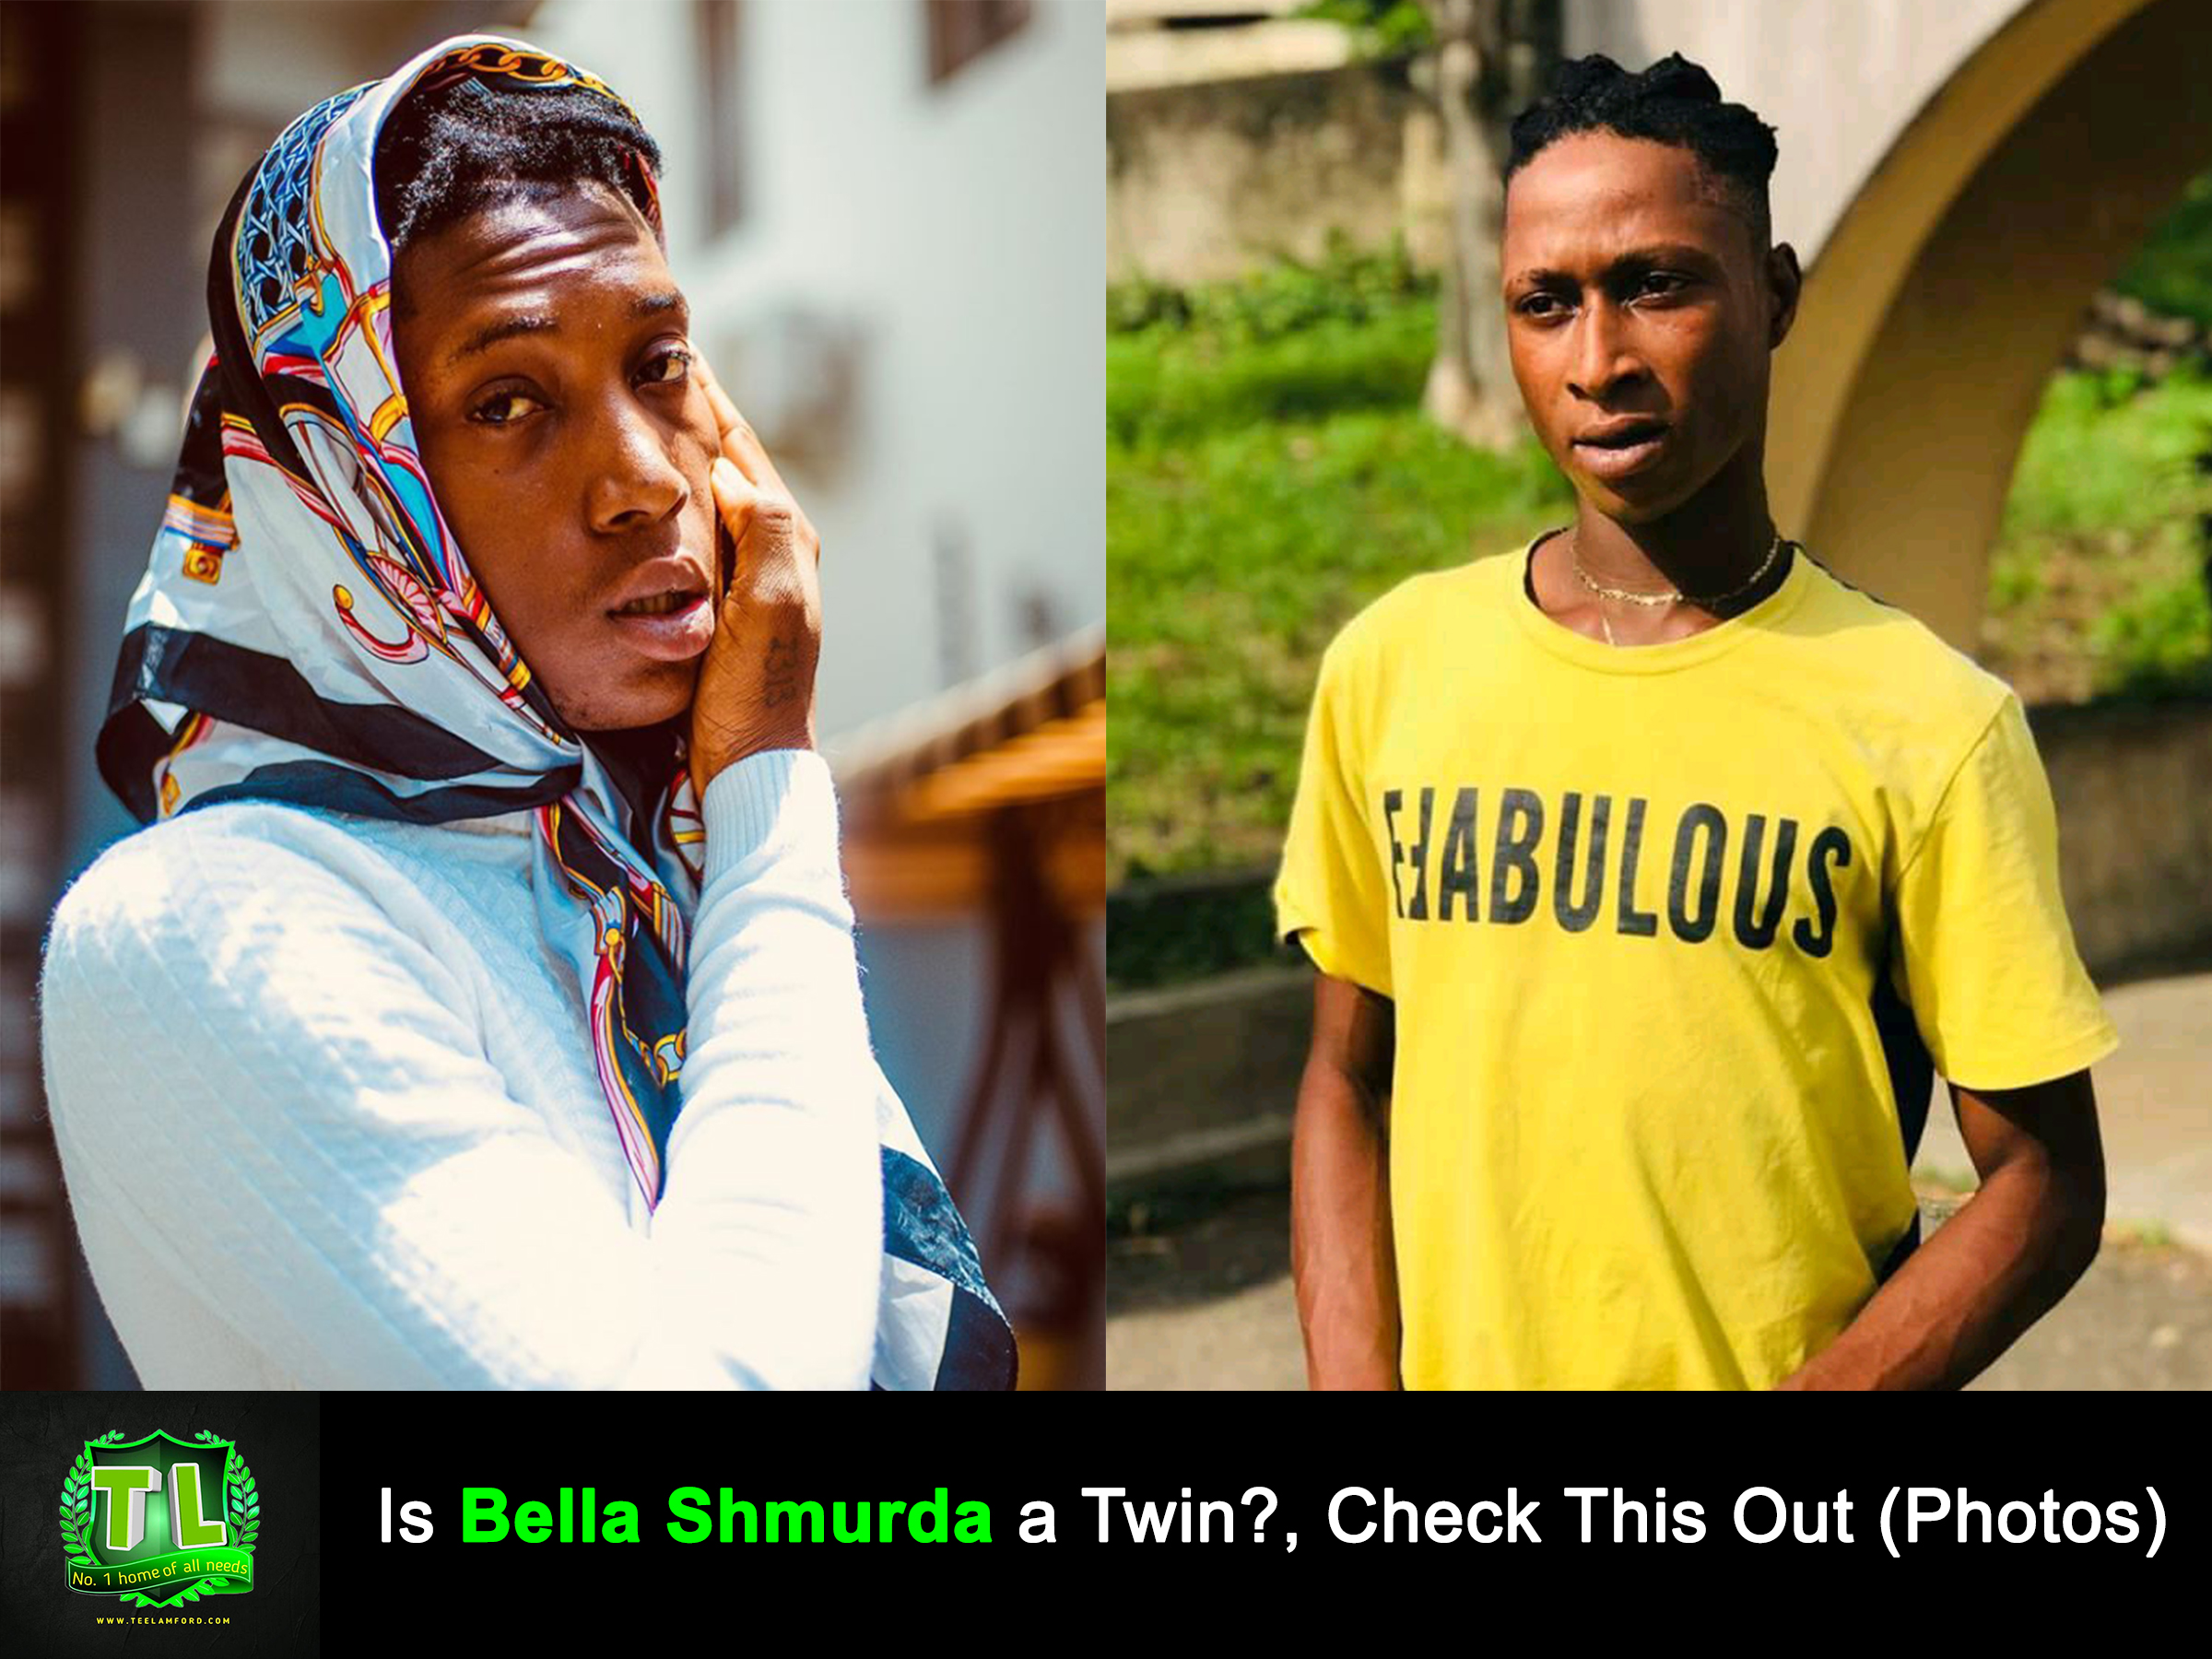 Is-Bella-Shmurda-a-Twin-Check-This-Out-Photos-Teelamford